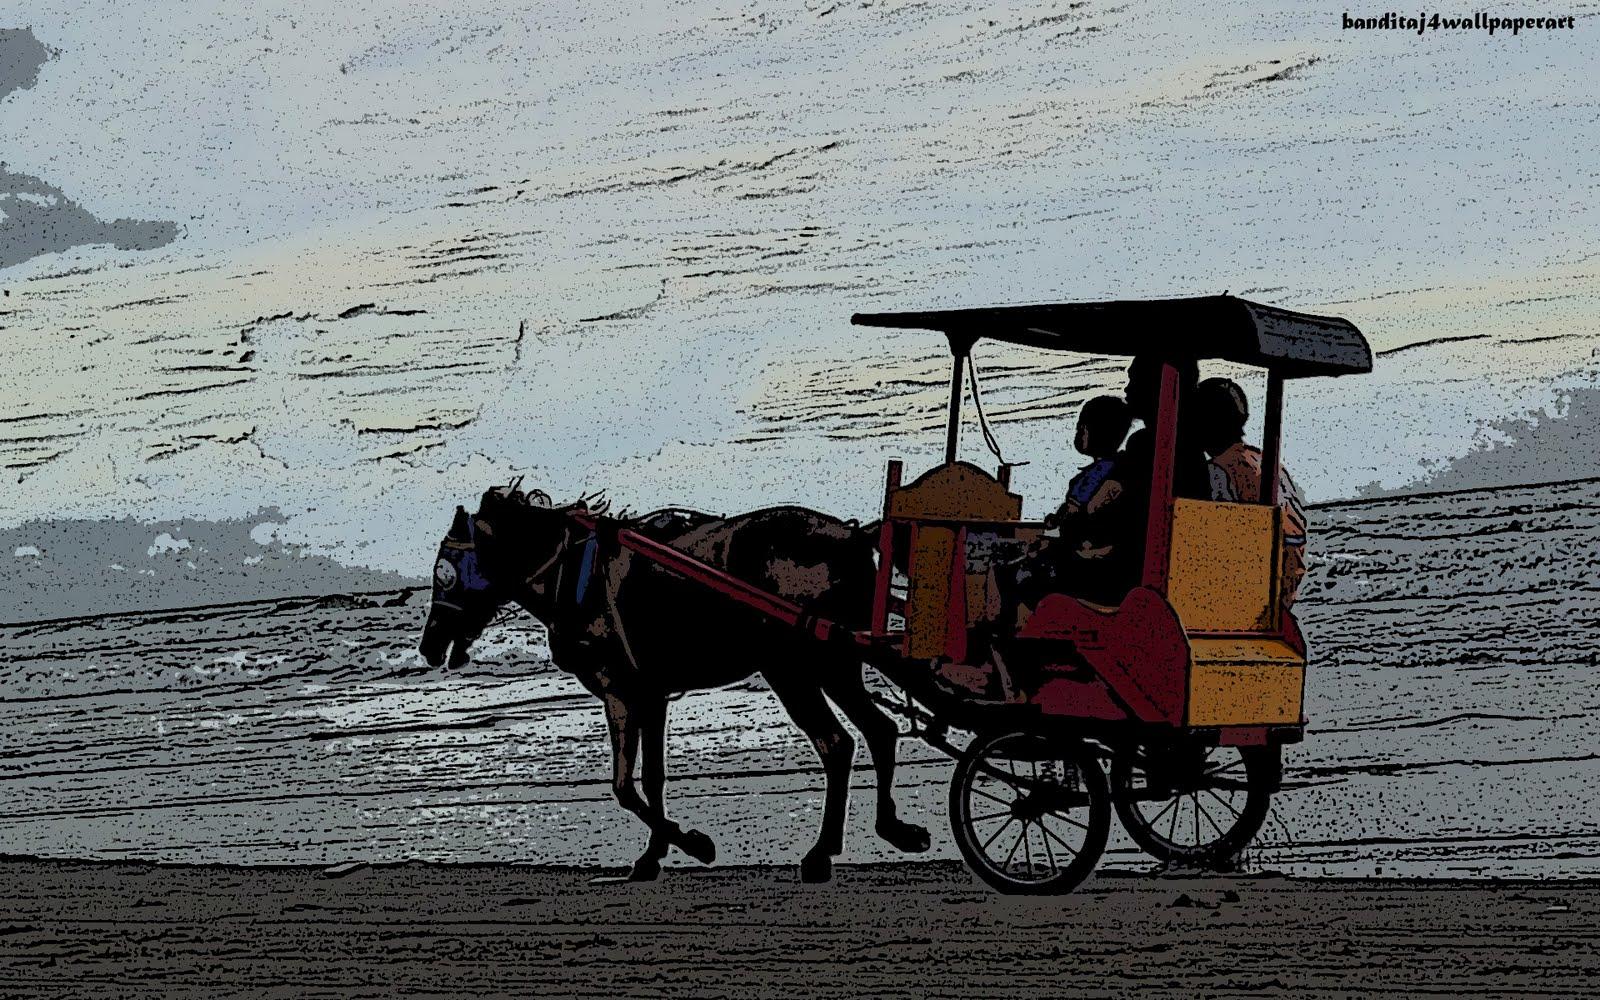 http://4.bp.blogspot.com/-Yb6bRSR-Tiw/TvidjLpJPtI/AAAAAAAABHQ/t9C0TY_Fg8s/s1600/horse-beach-delman-andong-cartoon-by-banditajj4wallpaperart.jpg